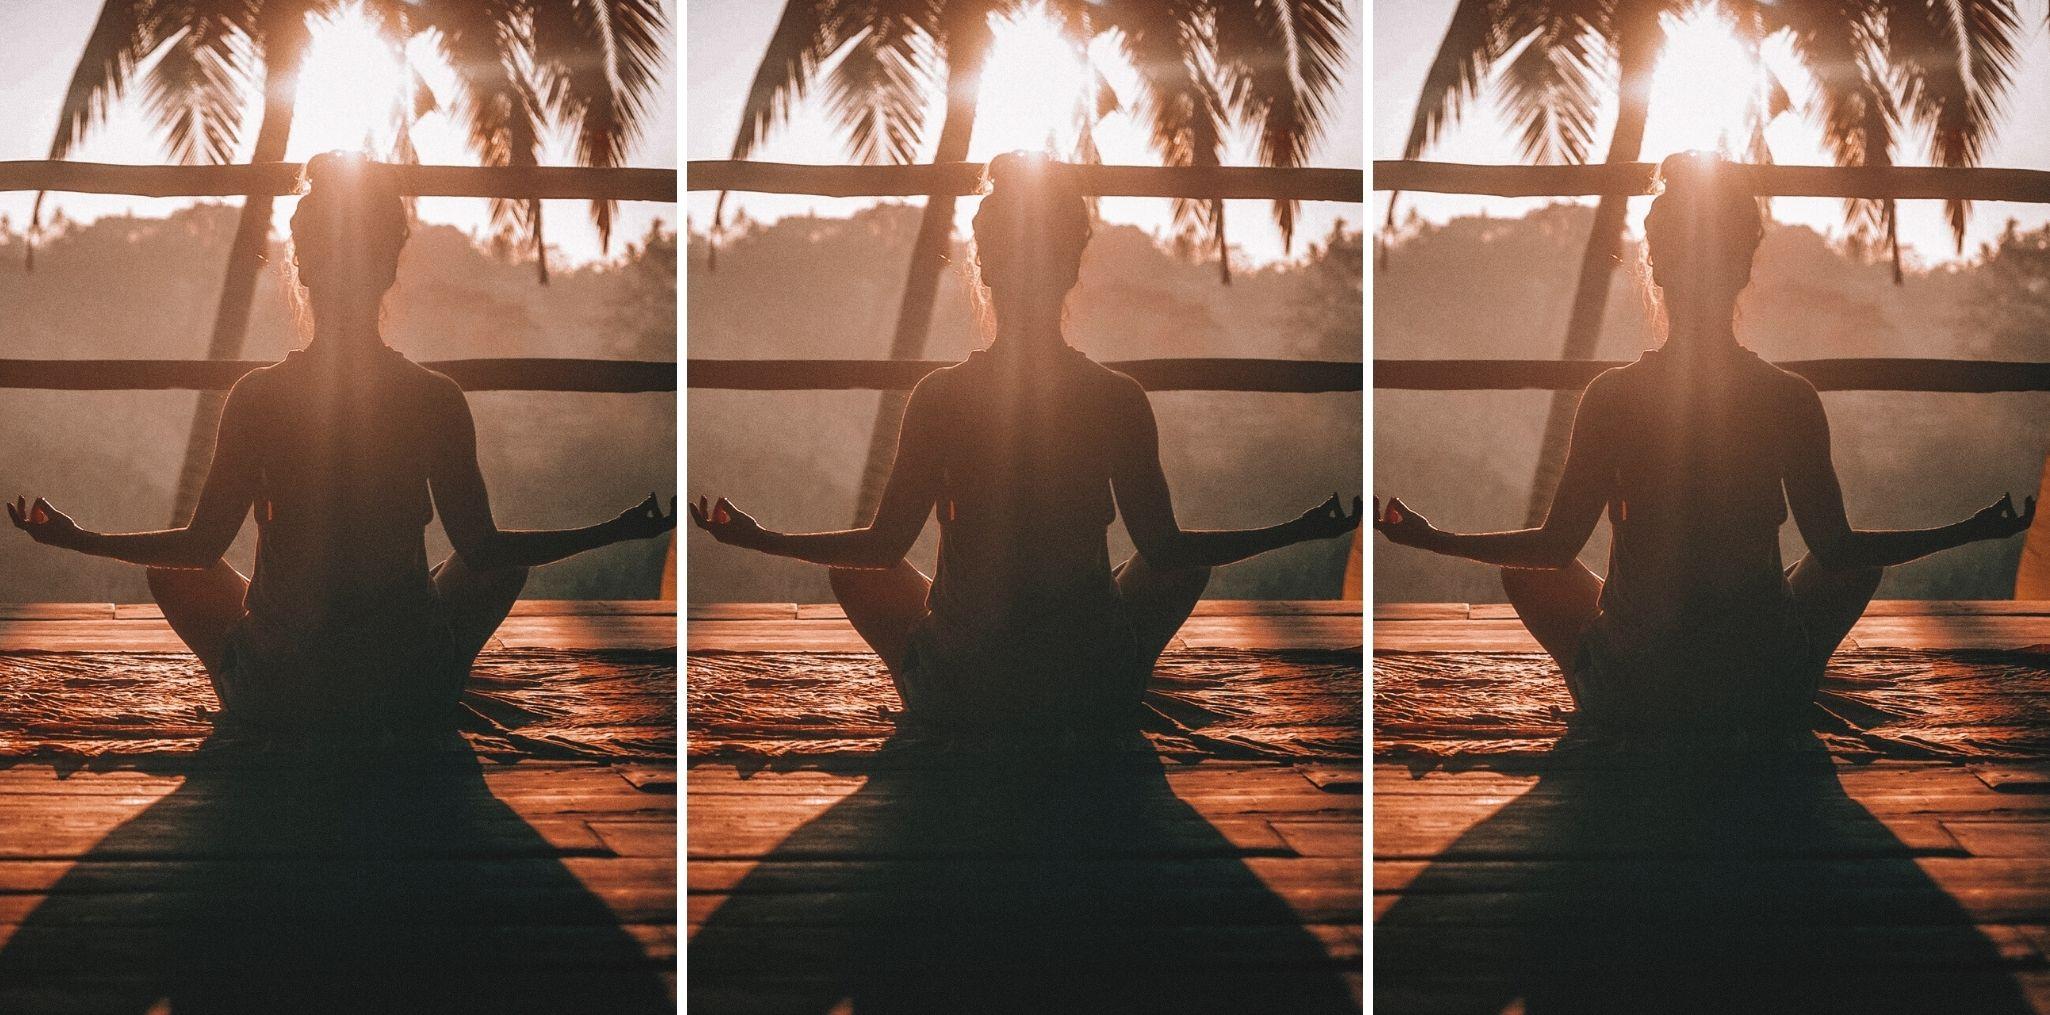 mindfulness_3_slowage365